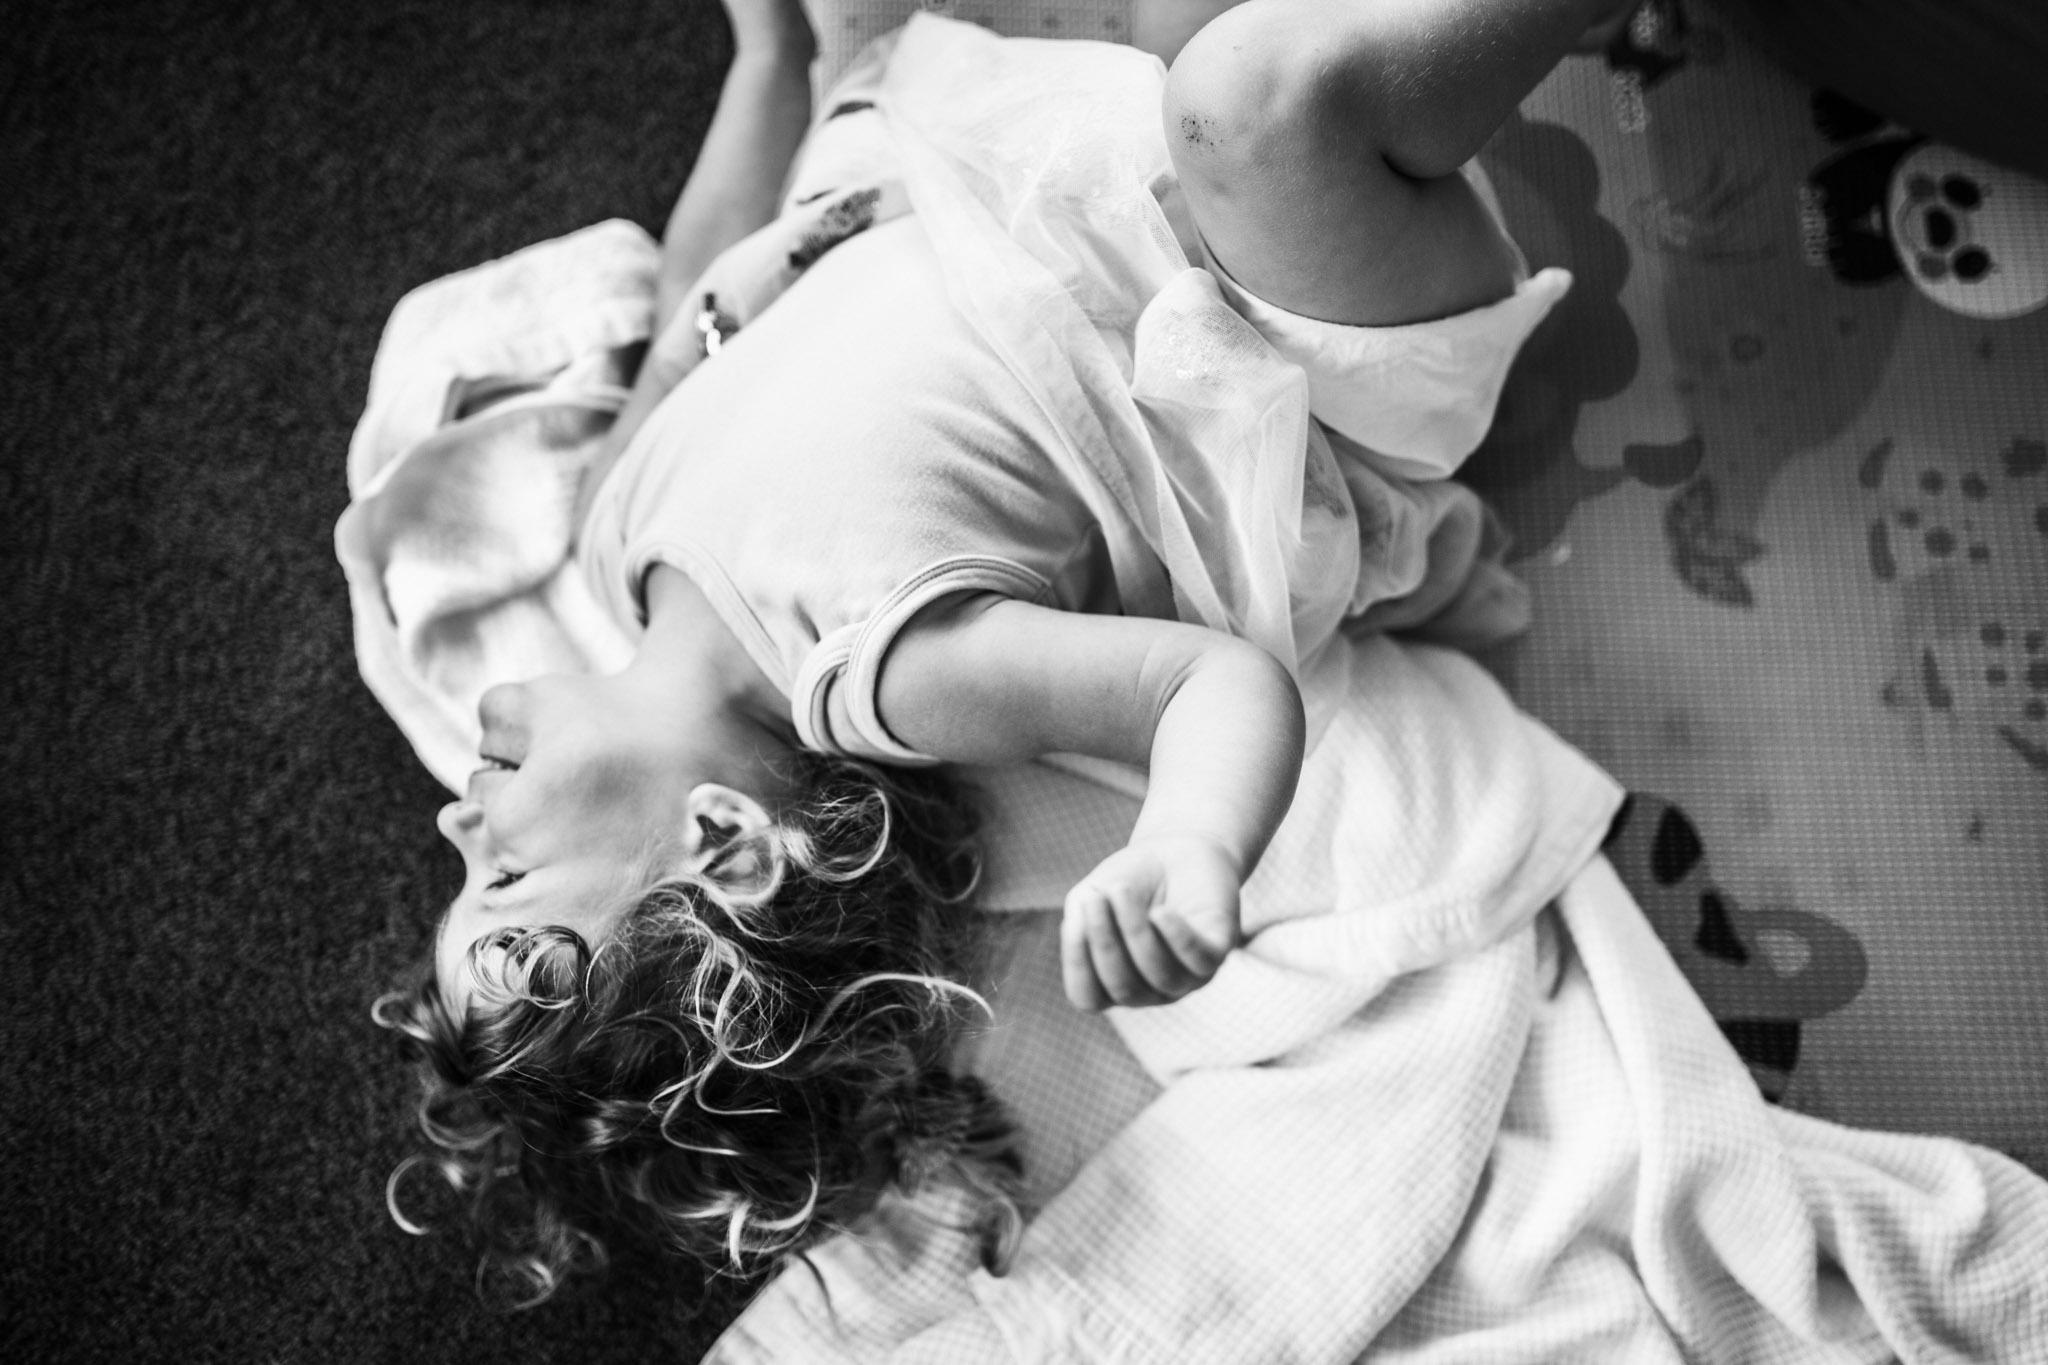 little-girl-on-playroom-floor (1 of 1).jpg